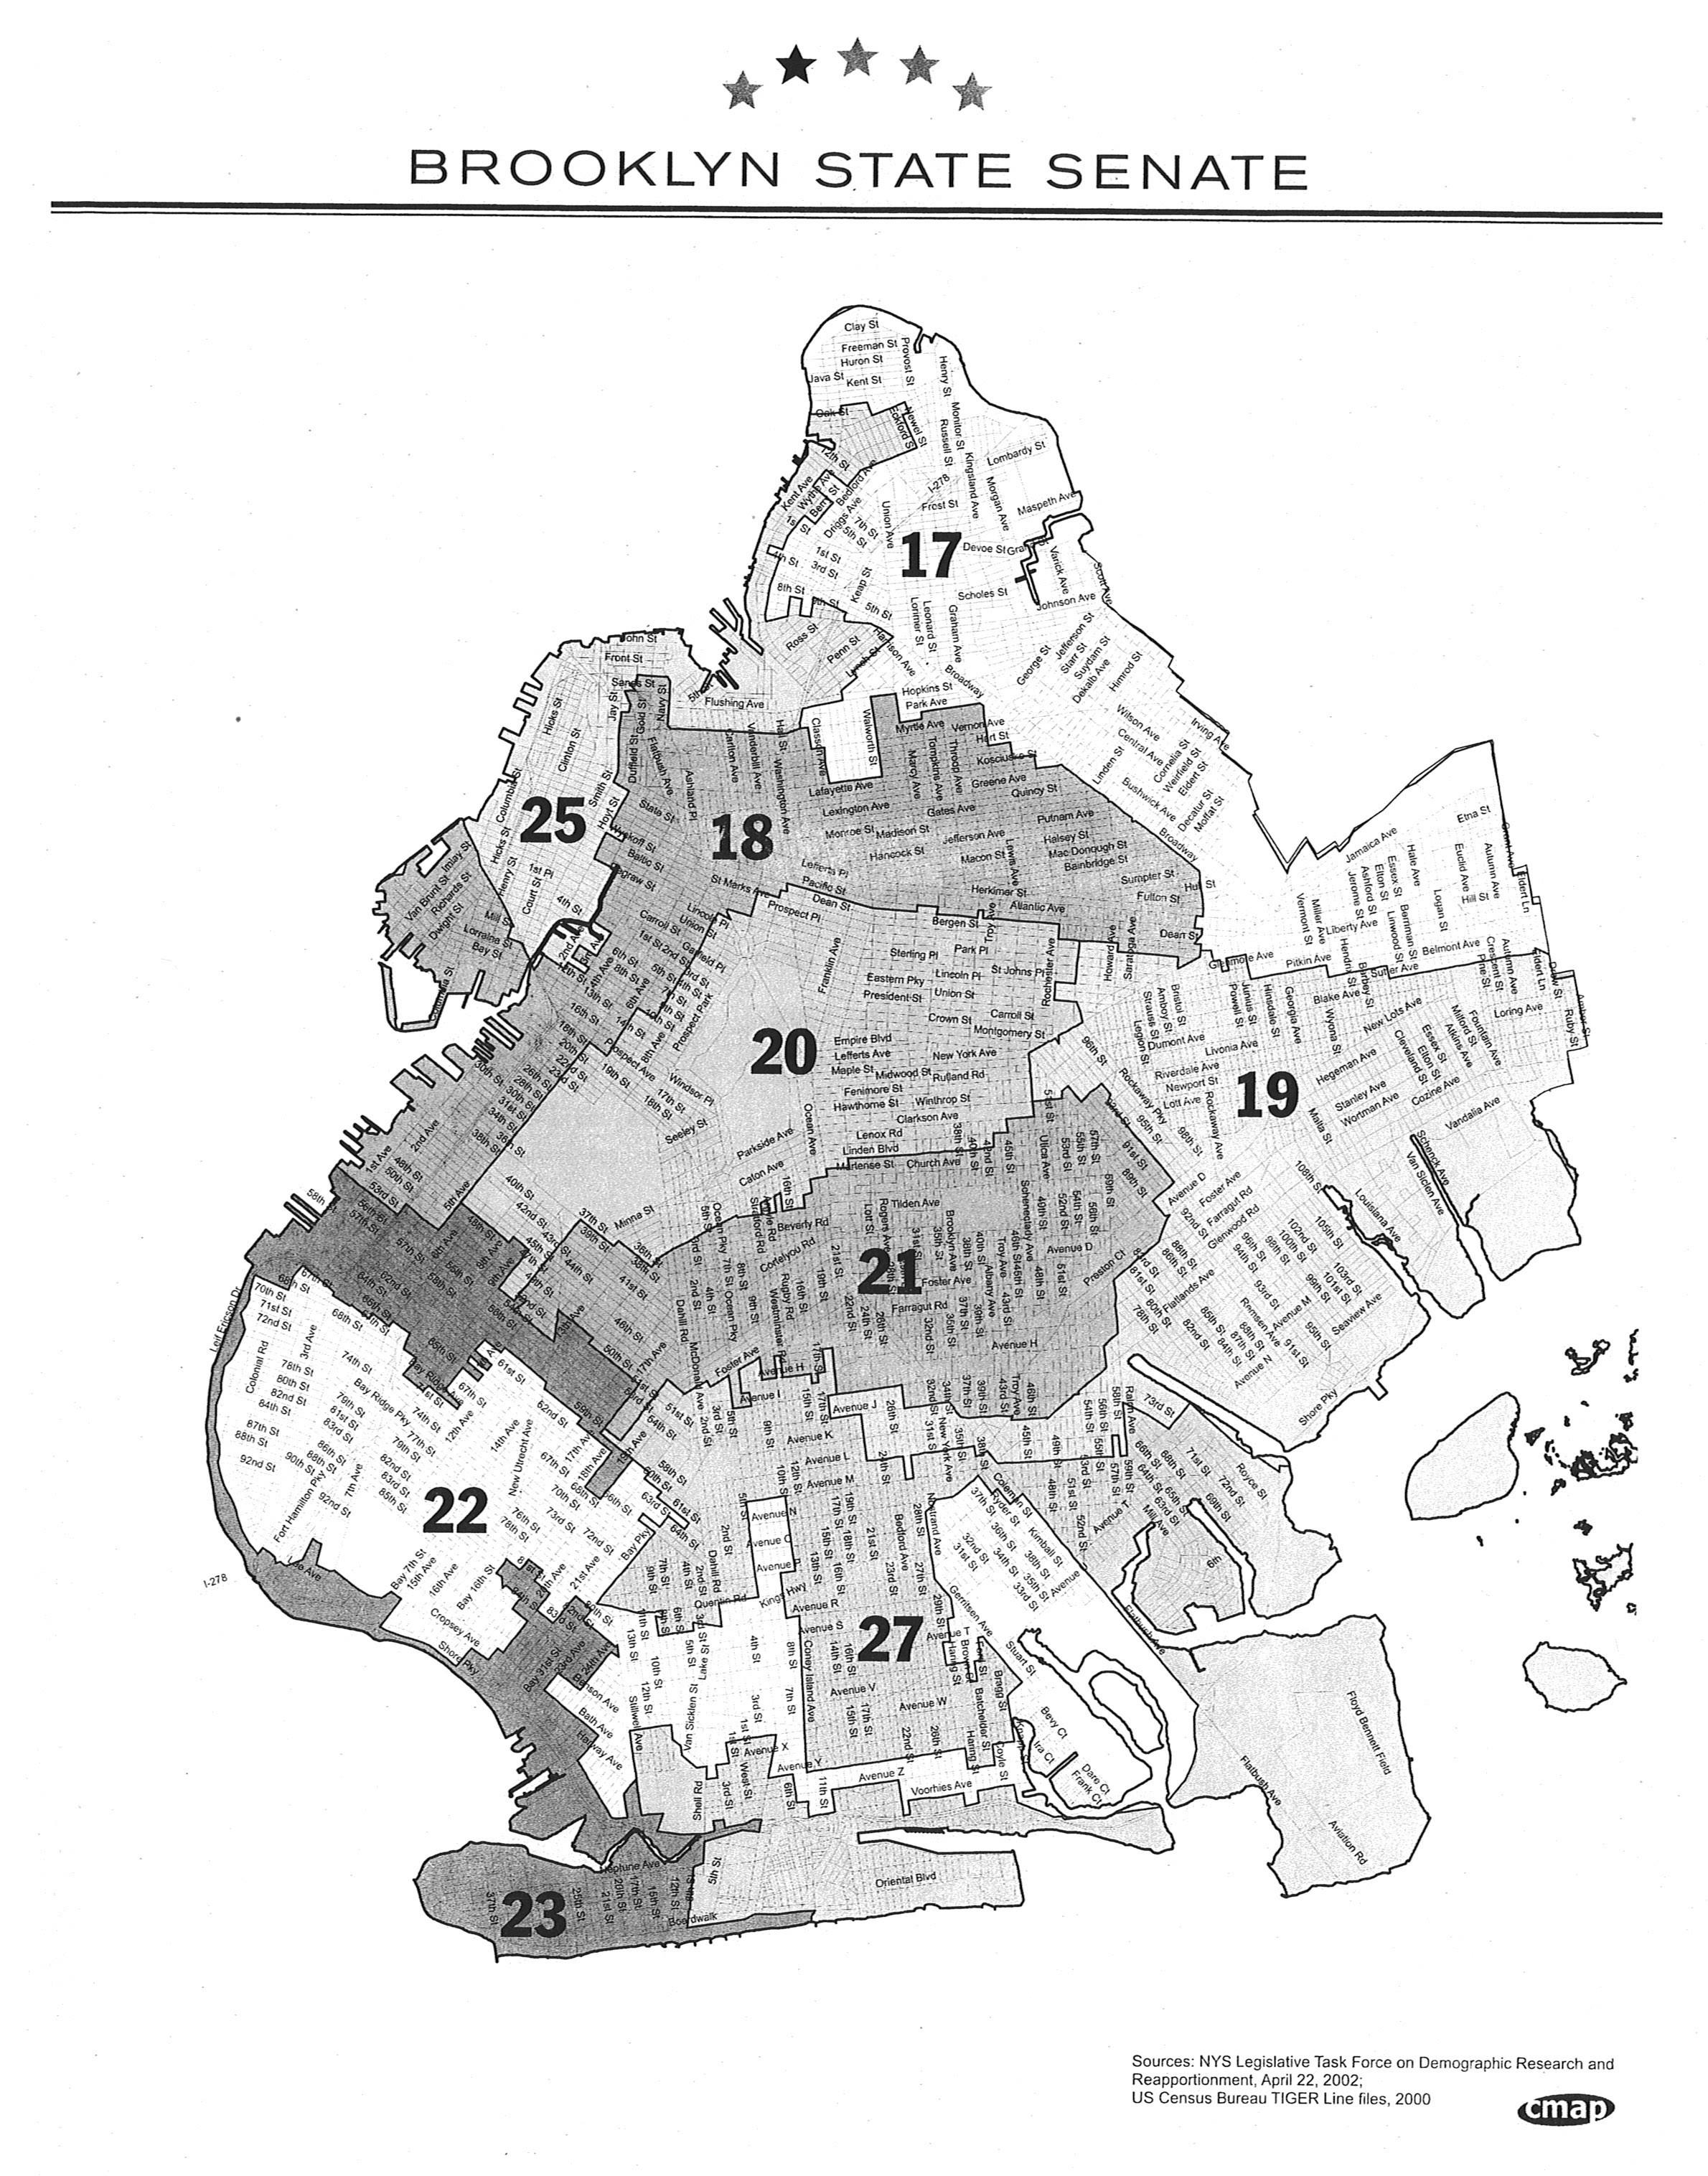 Brooklyn state senate map